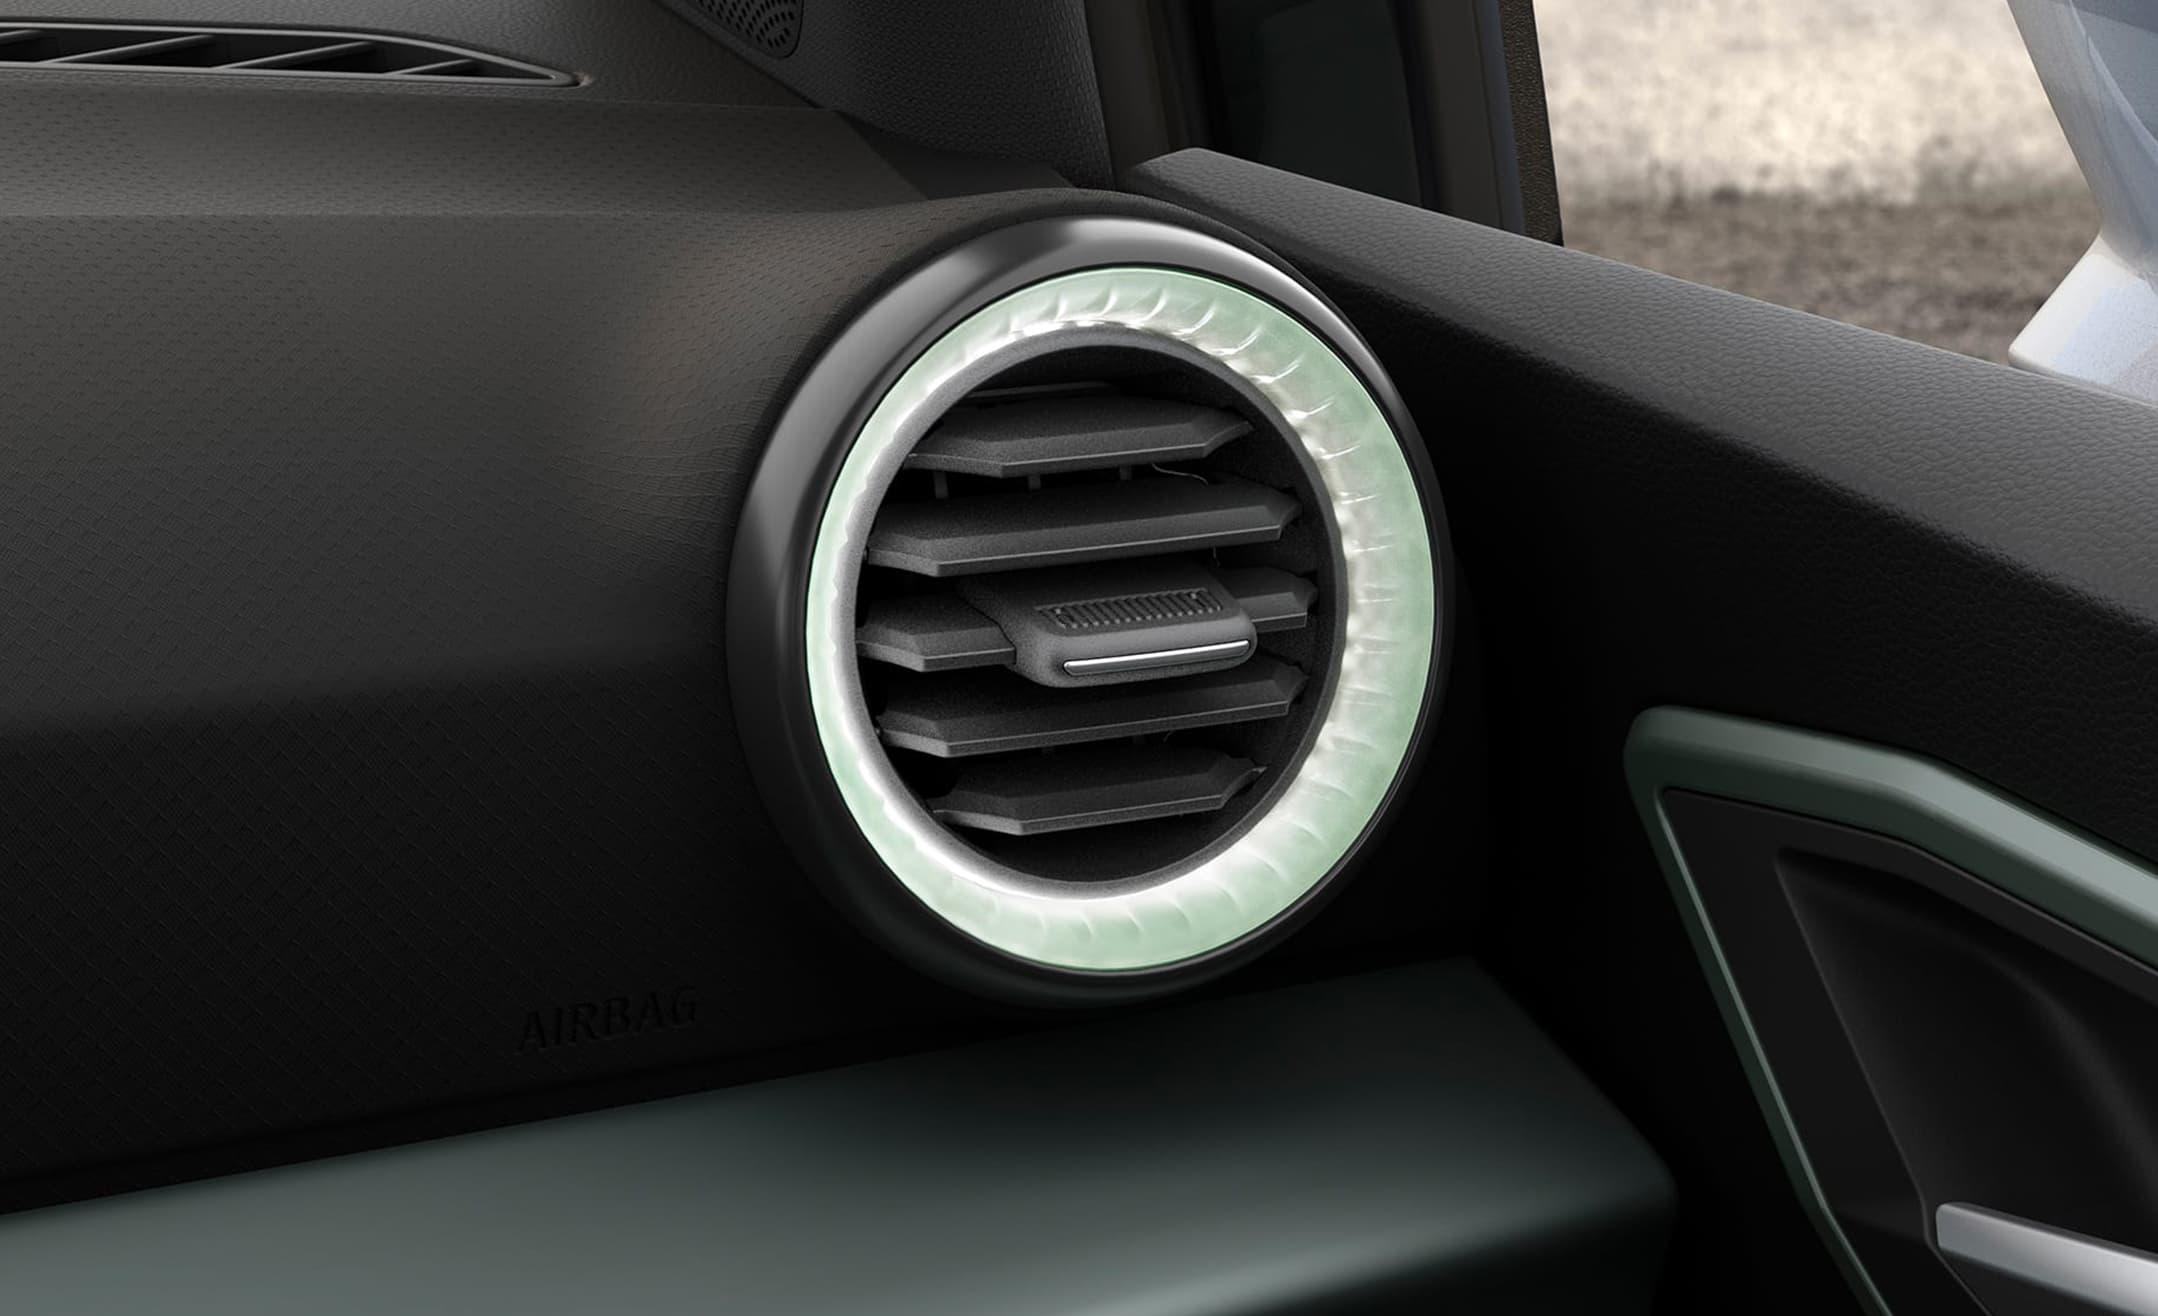 SEAT Arona 2021 LED-belysningen runt luftinslappen